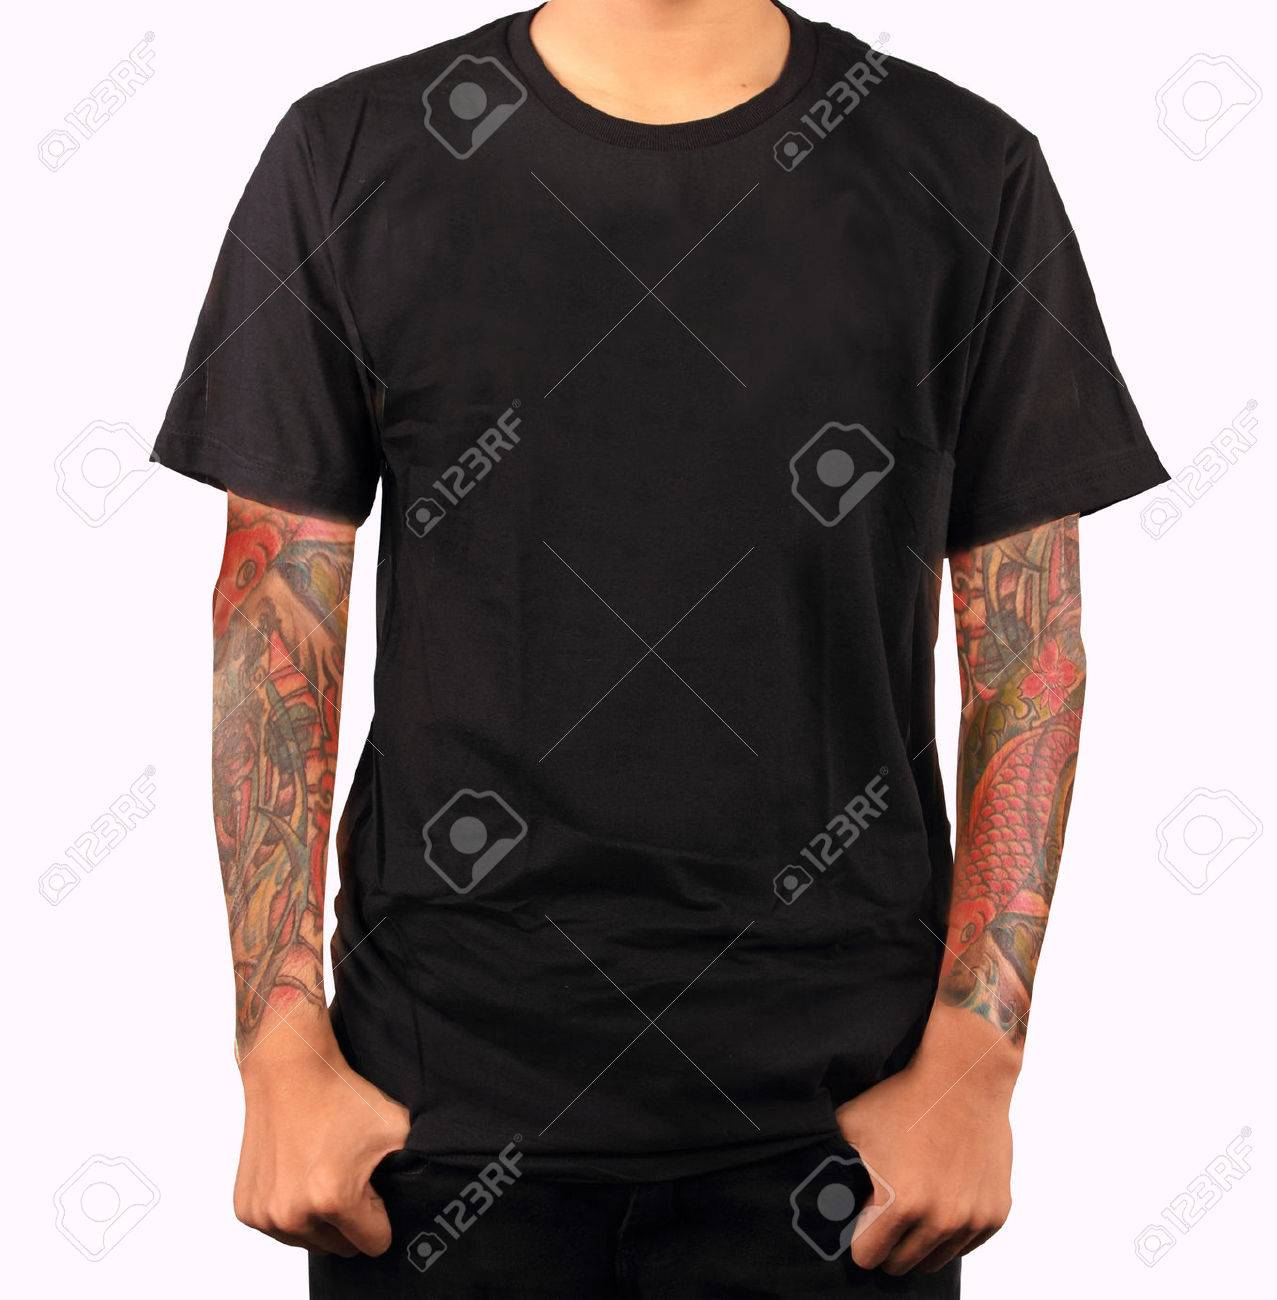 Black t shirt blank template - T Shirt Template Stock Photo 26749289